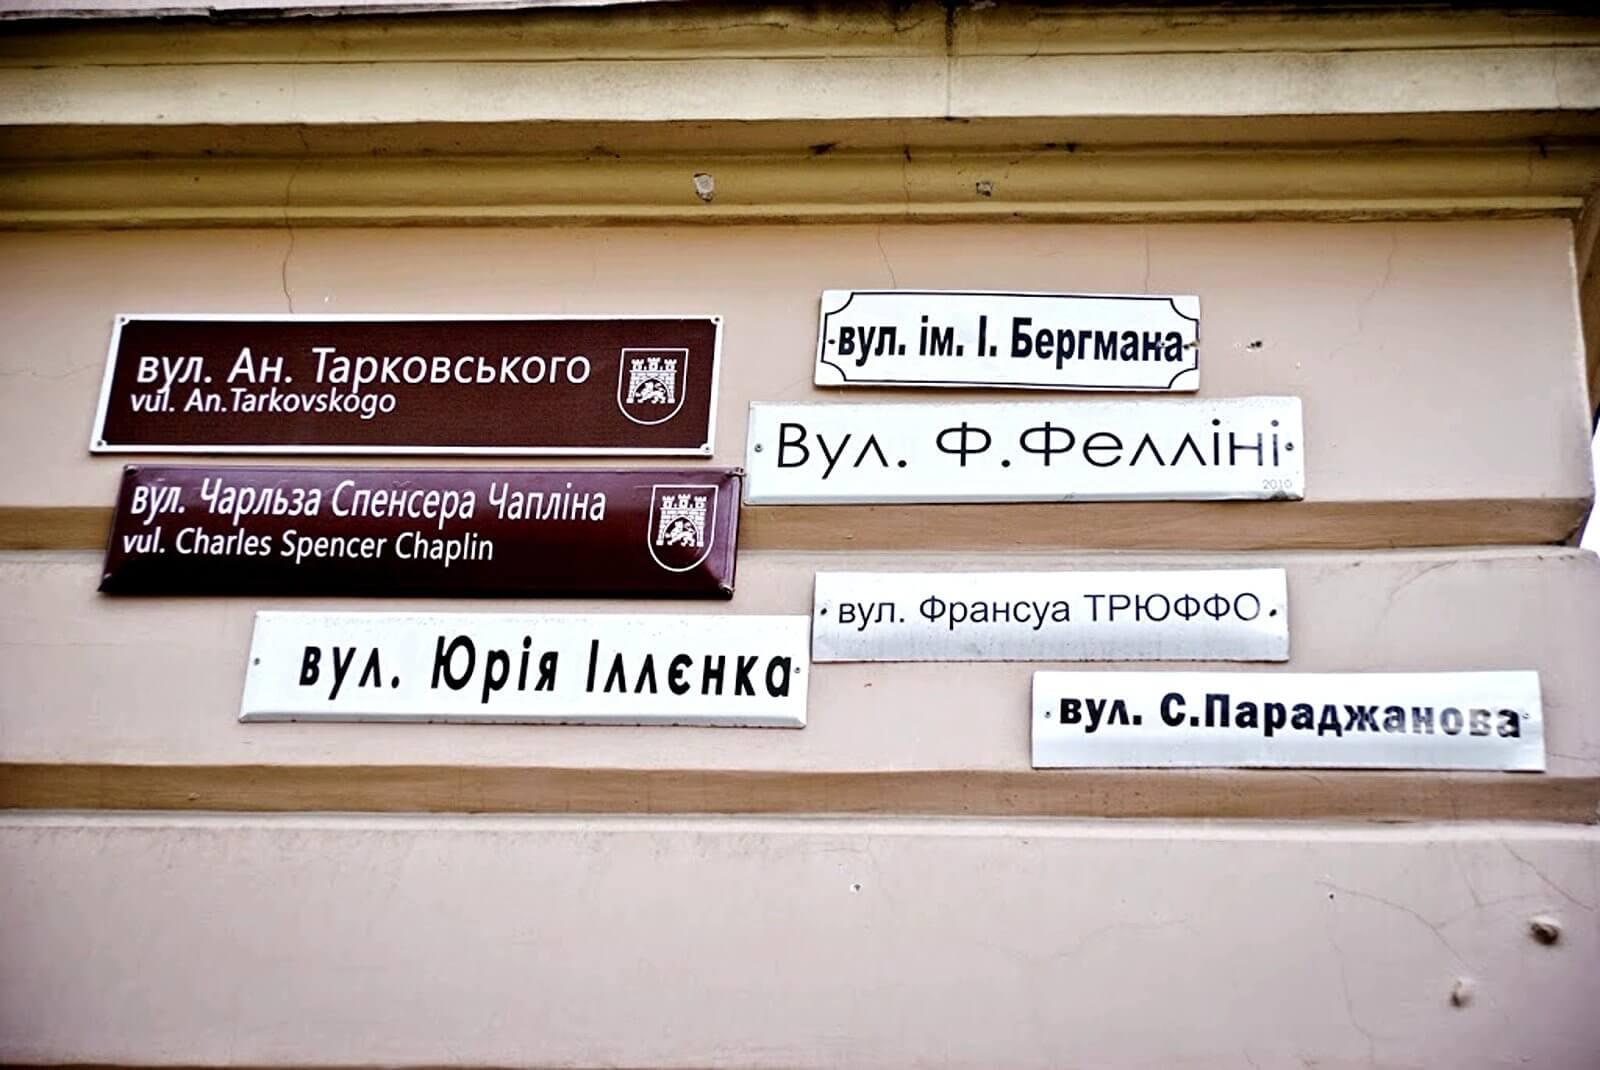 lviv old town street 7 names